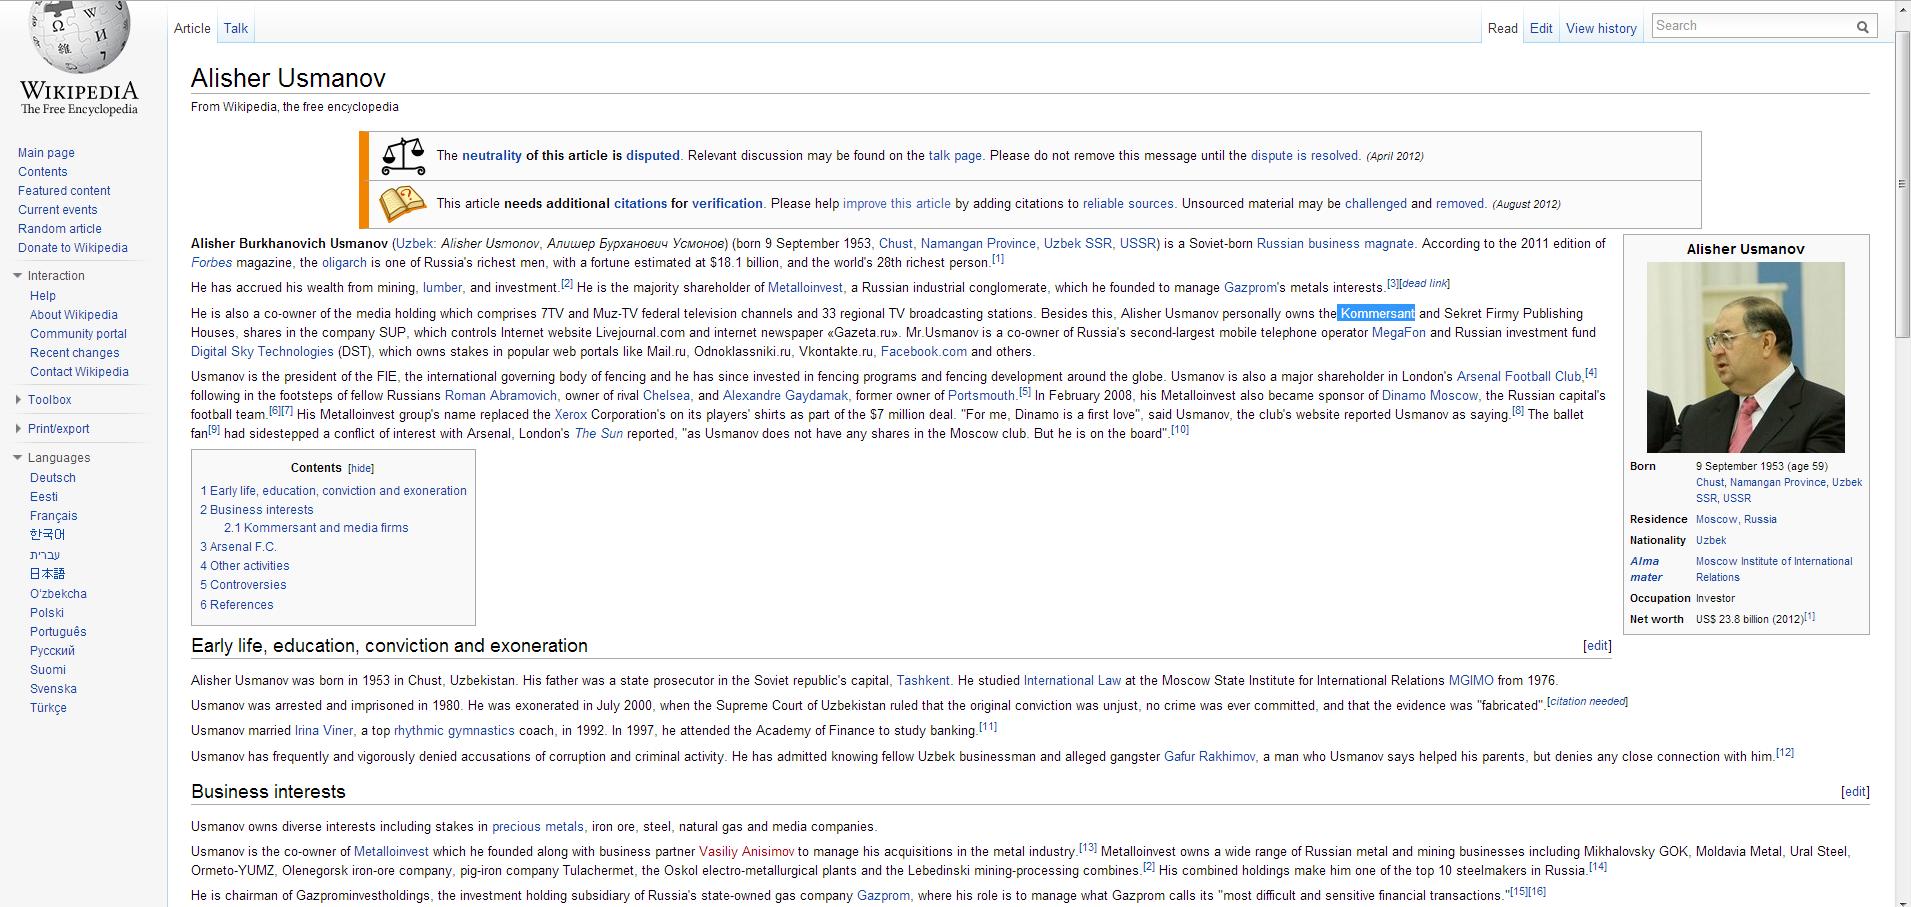 Alisher Usmaov wikipedia edited2